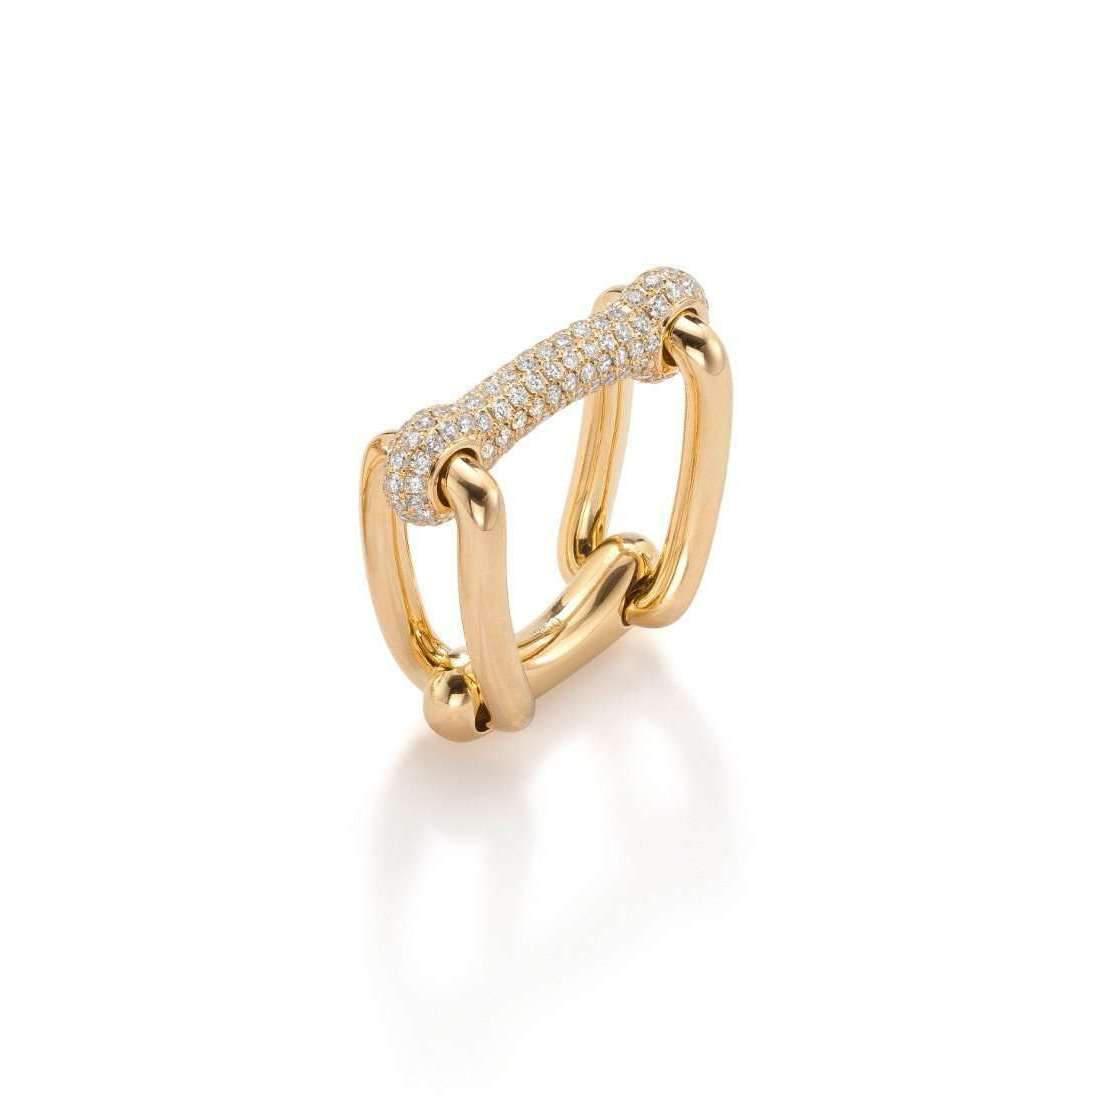 Shakti Ellenwood 18kt Fairtrade Mia Diamond Ring - UK P - US 7 1/2 - EU 56 1/2 XwRF3